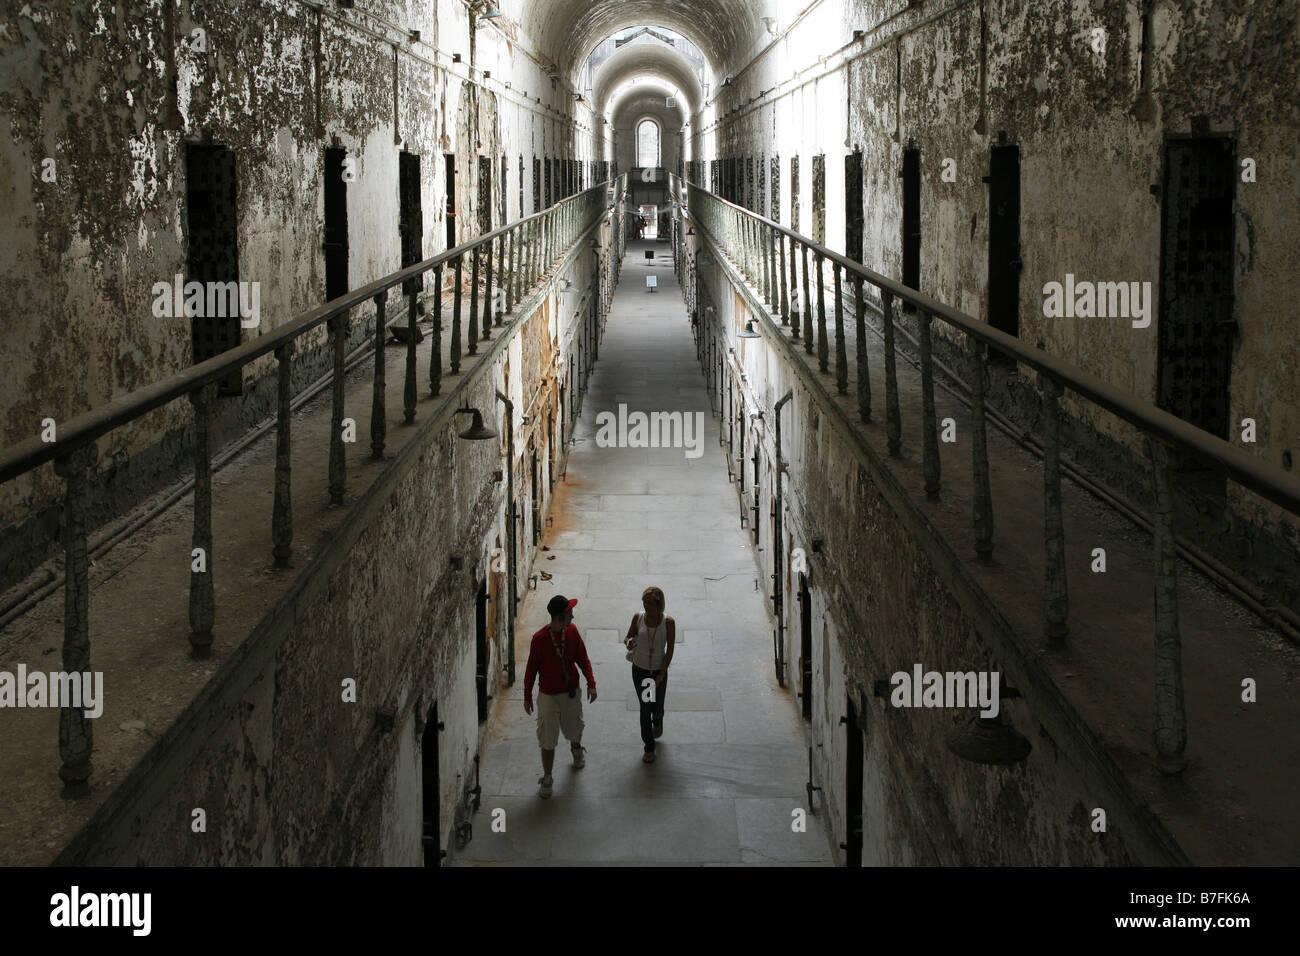 Eastern State Penitentiary, Philadelphia, Pennsylvania, USA - Stock Image